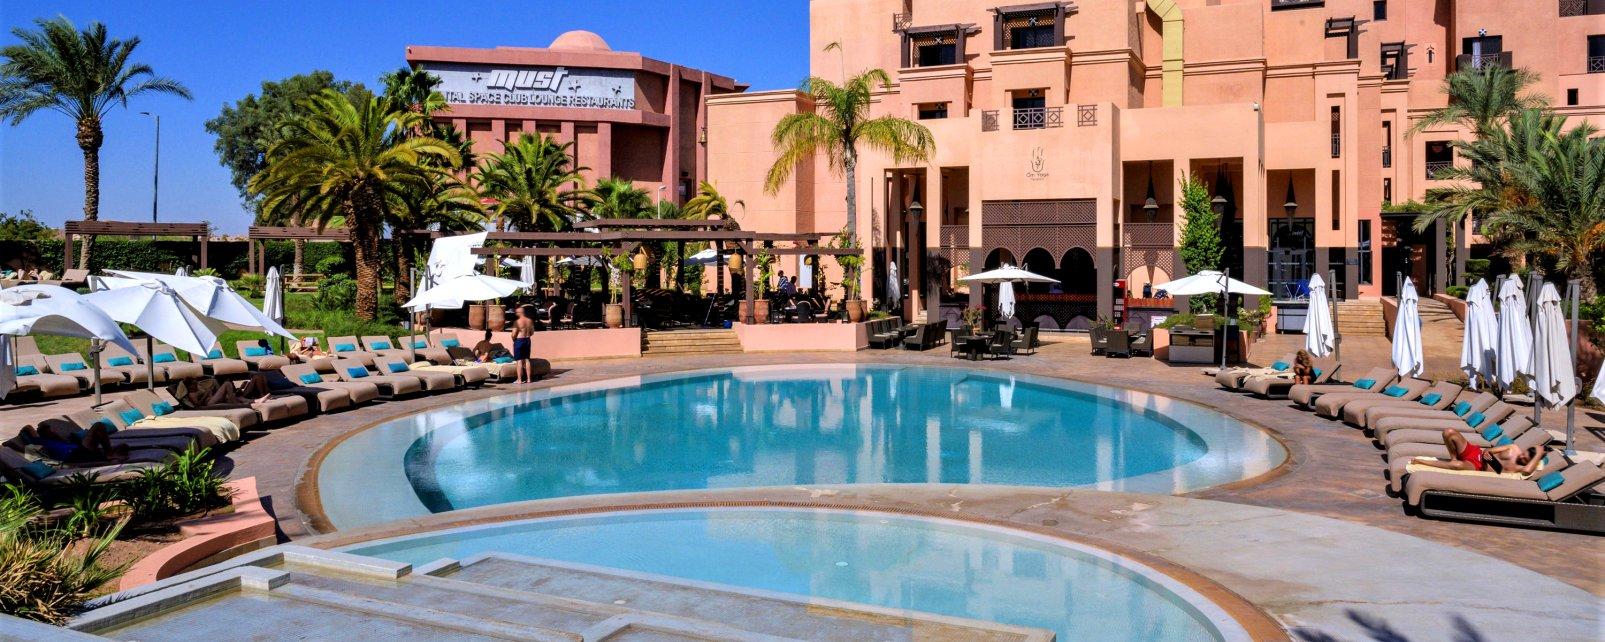 Hotel Movenpick Mansour Eddahbi